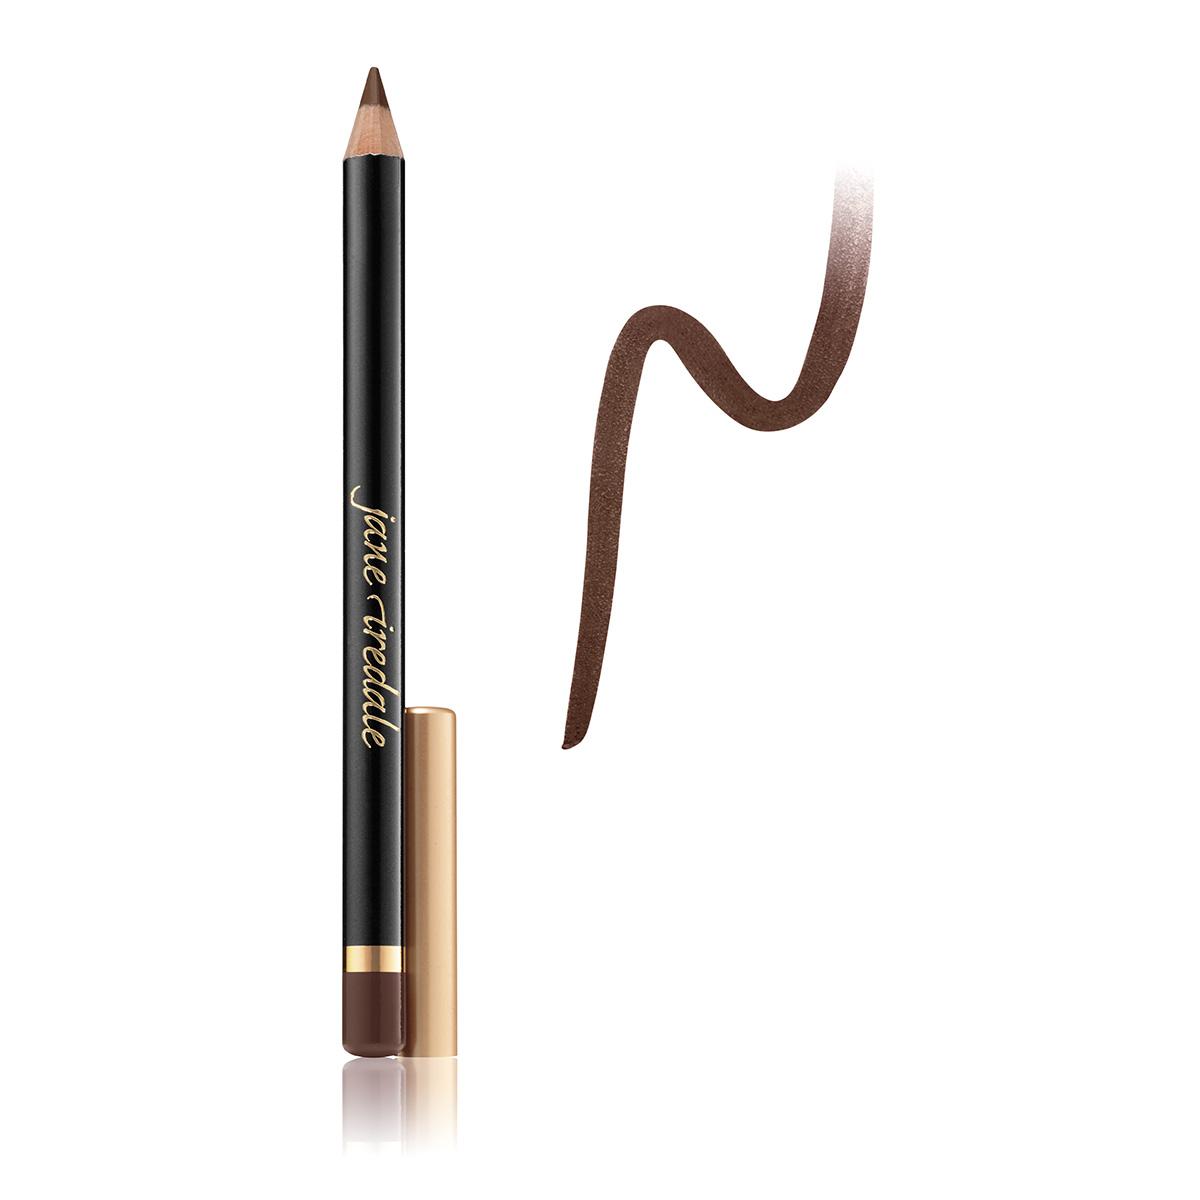 Jane Iredale Eye Pencil, basic brown